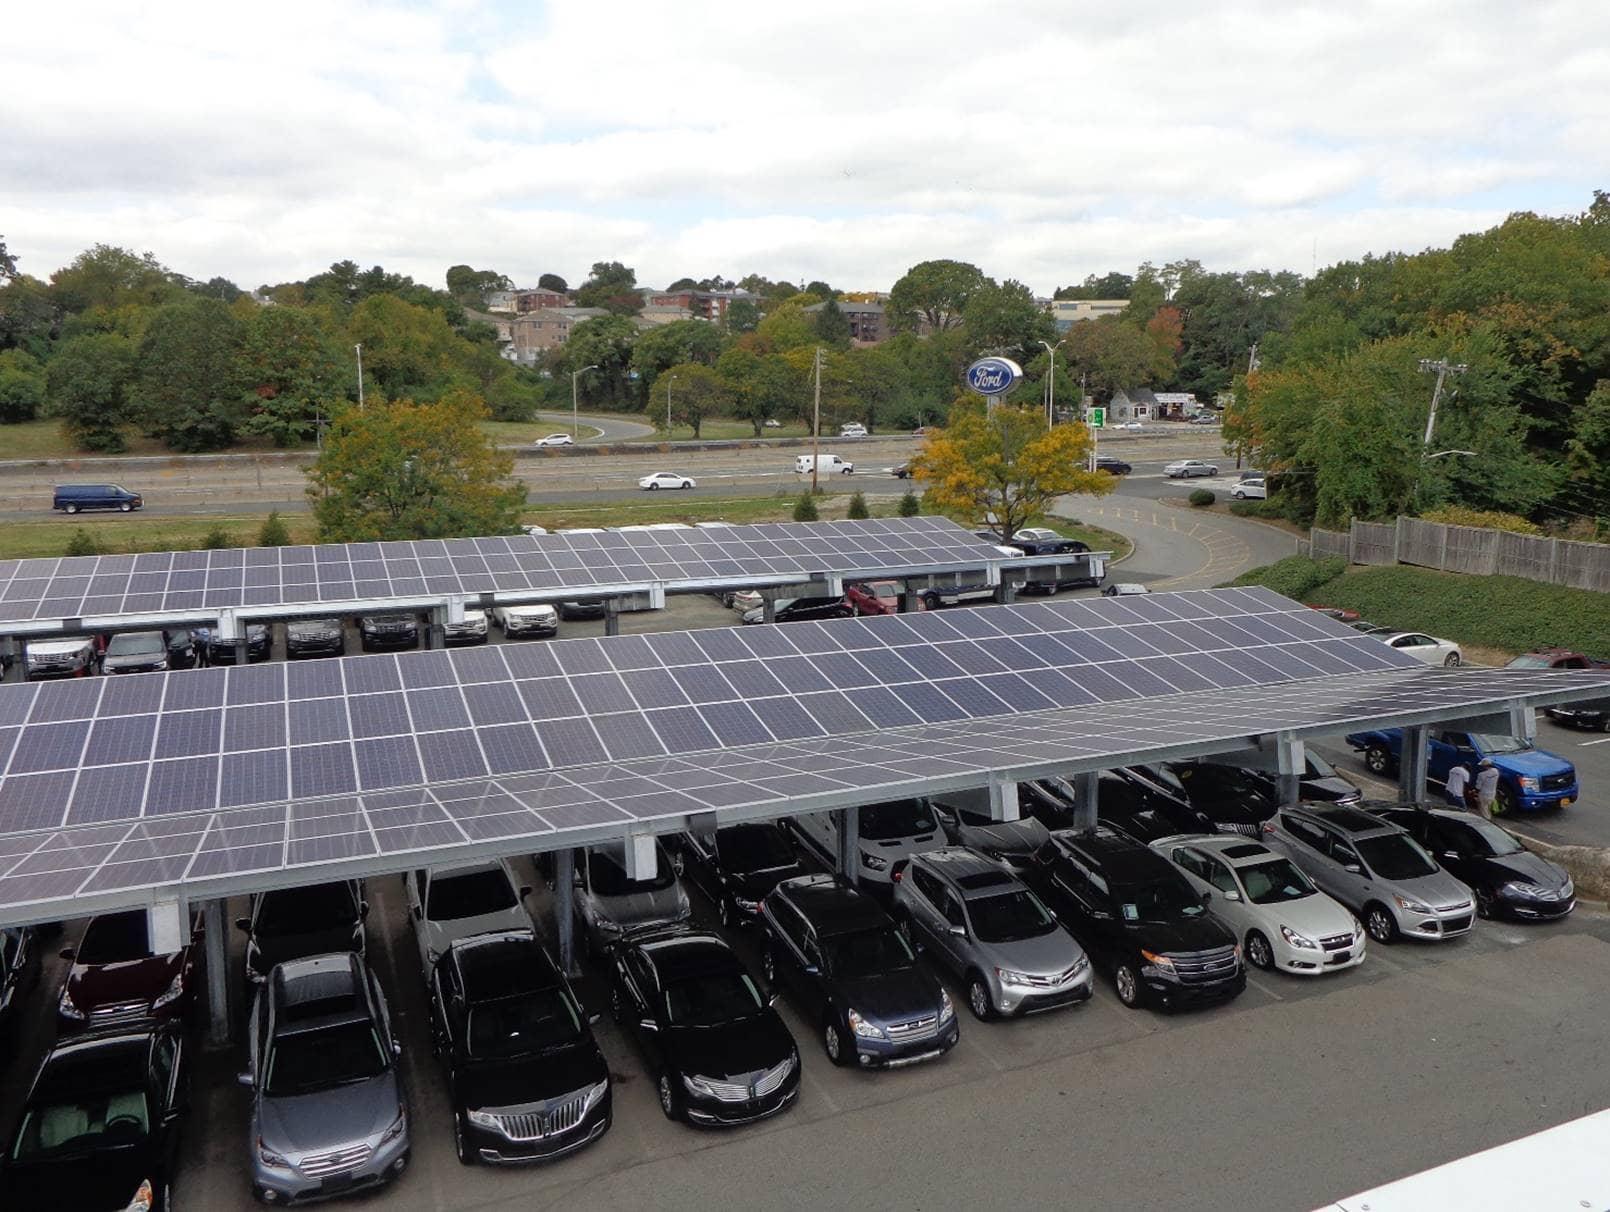 New york auto dealer goes fully solar solar industry for State motors lincoln dealer manchester nh